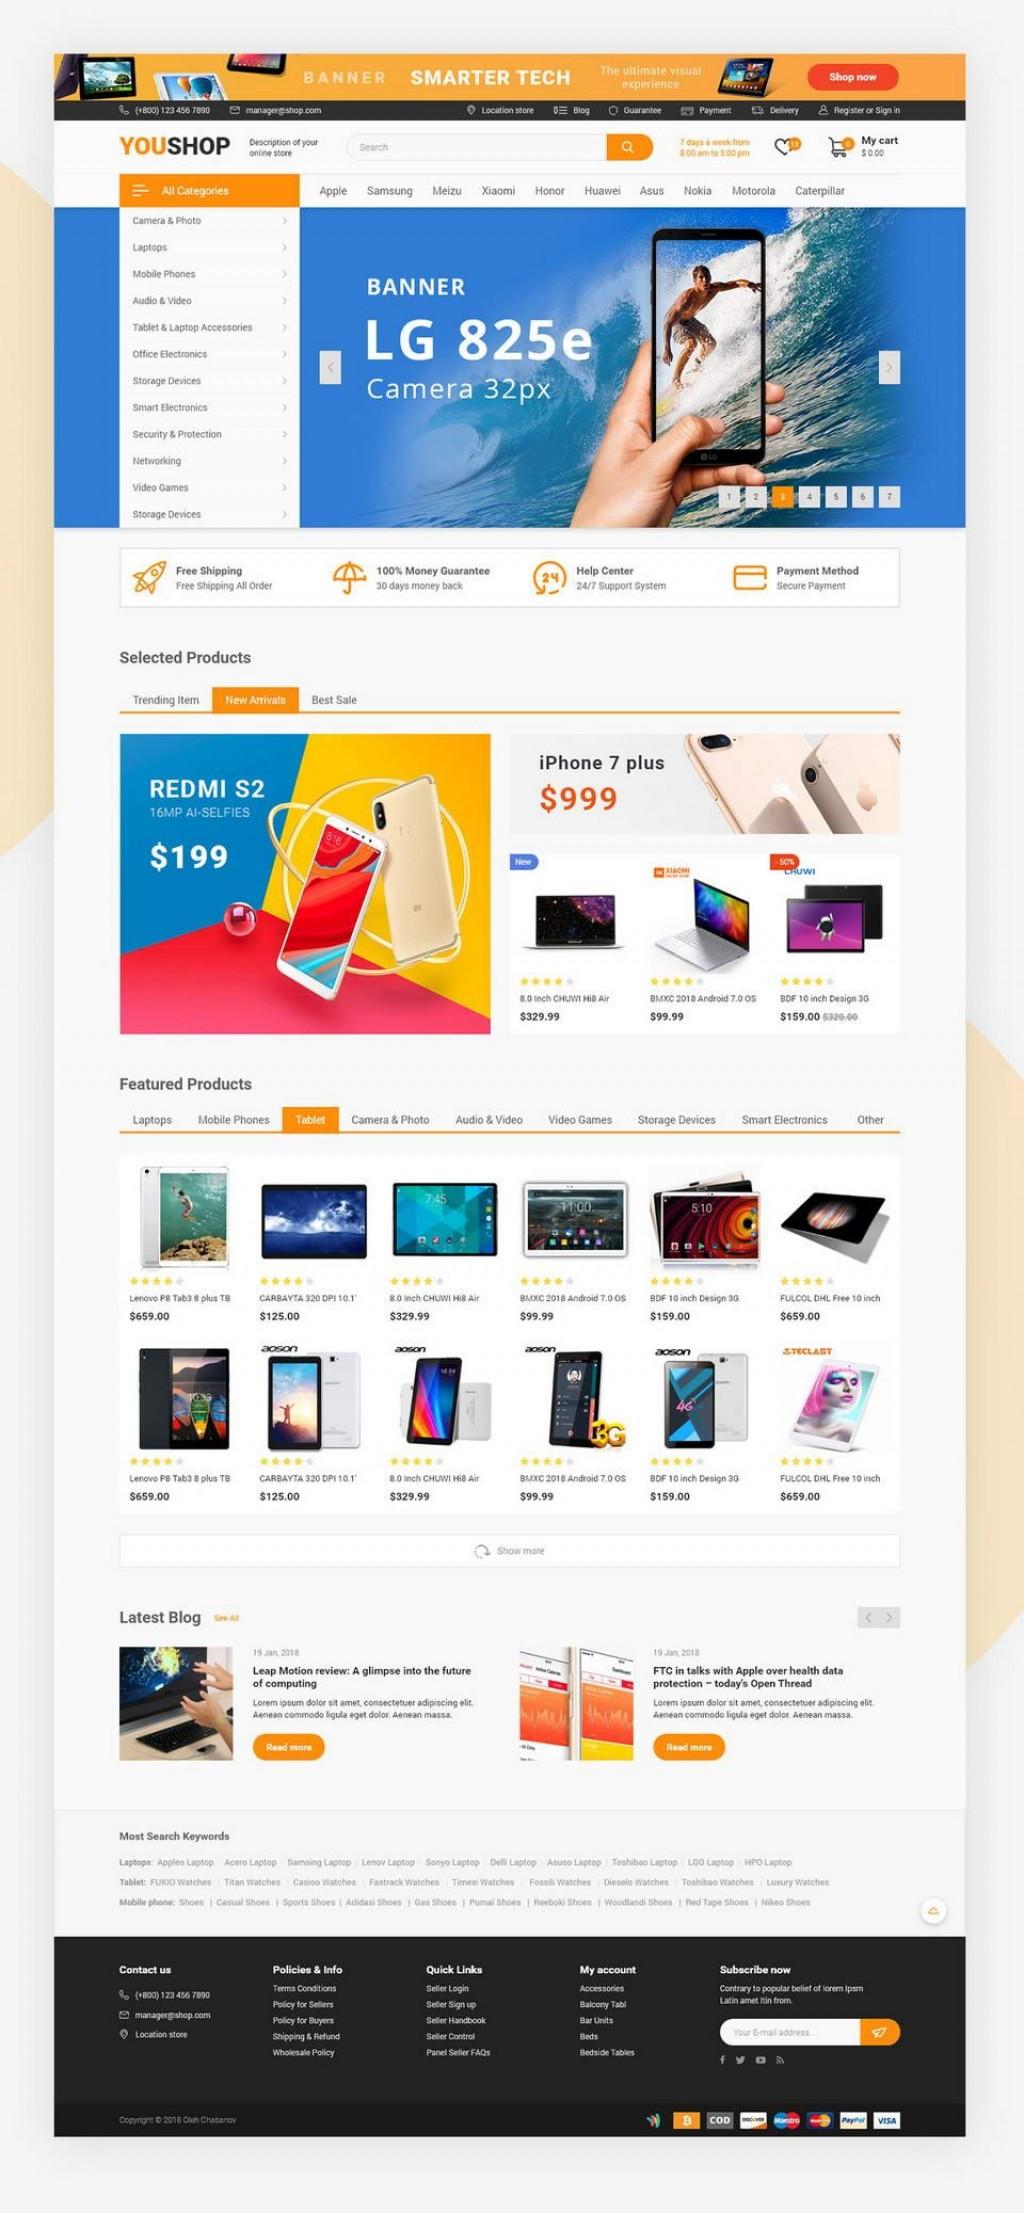 006 Astounding Free E Commerce Website Template Image  Ecommerce Html Cs Bootstrap PhpLarge